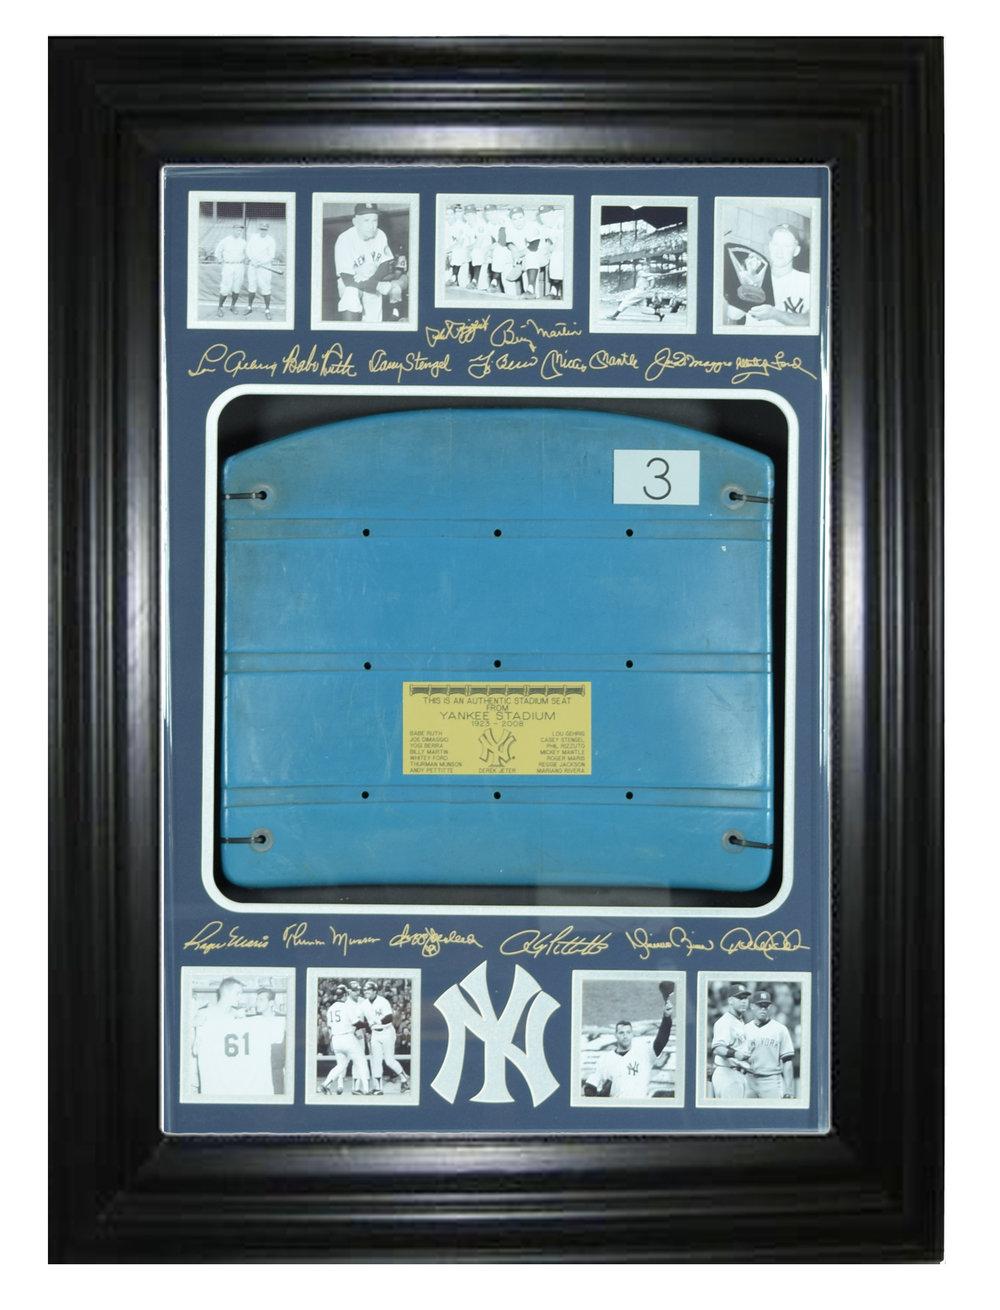 Yankees Seat.jpg